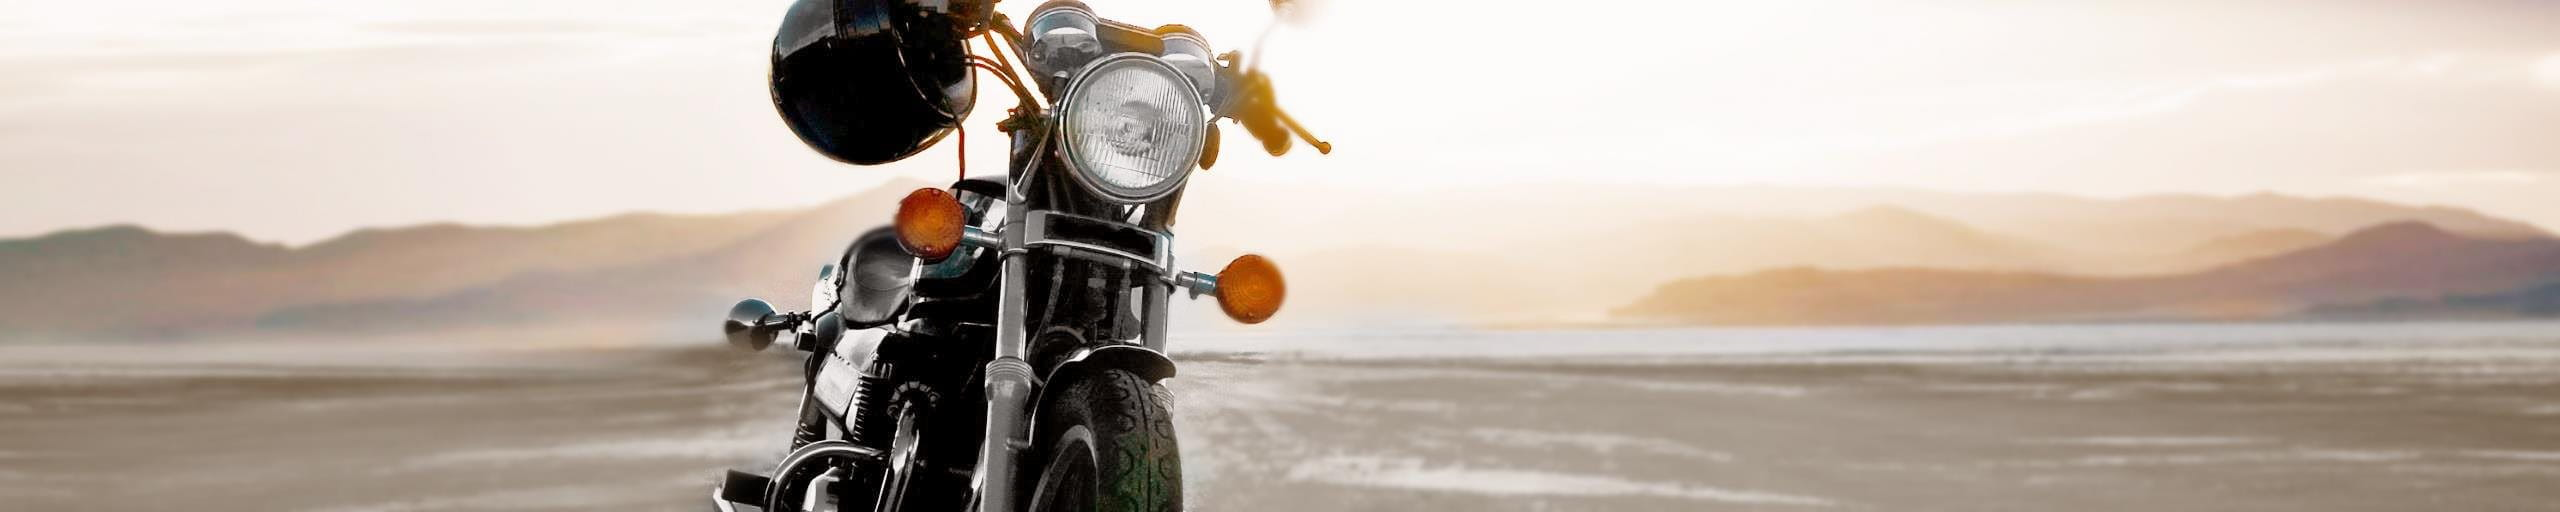 Motorrad in der Landschaft